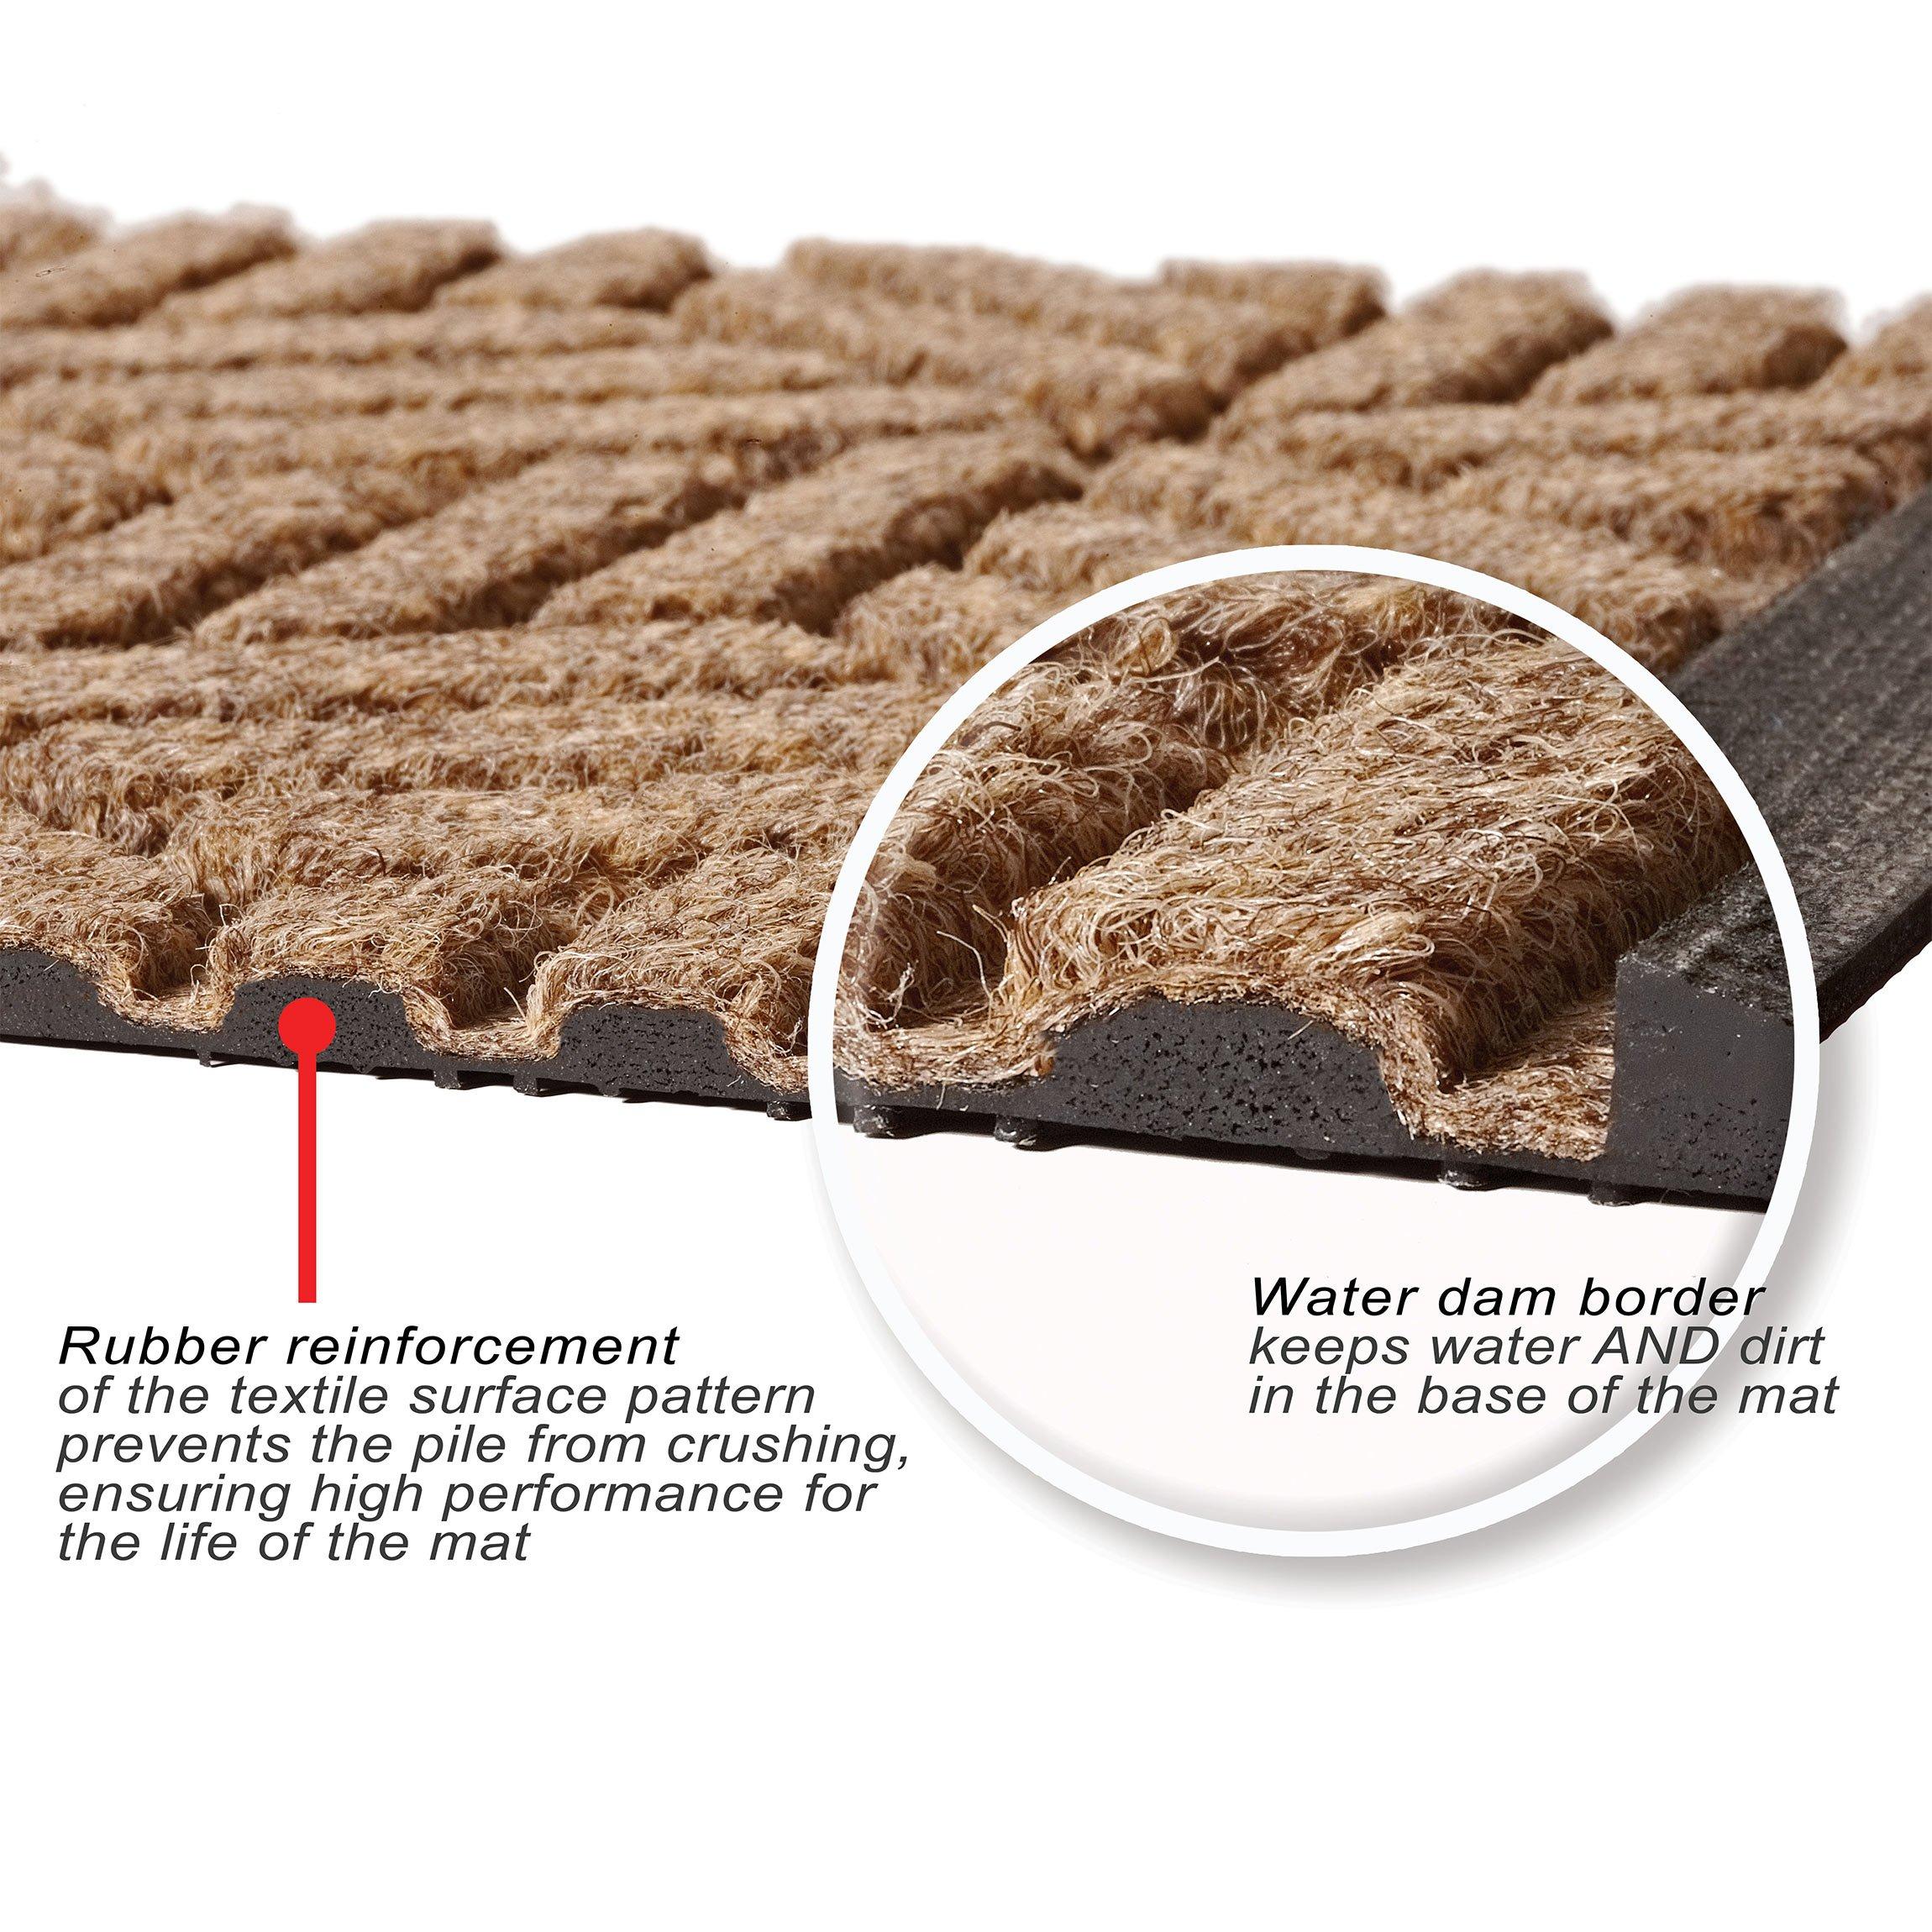 Bungalow Flooring Waterhog Indoor/Outdoor Doormat, 3' x 5', Skid Resistant, Easy to Clean, Catches Water and Debris, Boxwood Collection, Bluestone by Bungalow Flooring (Image #7)